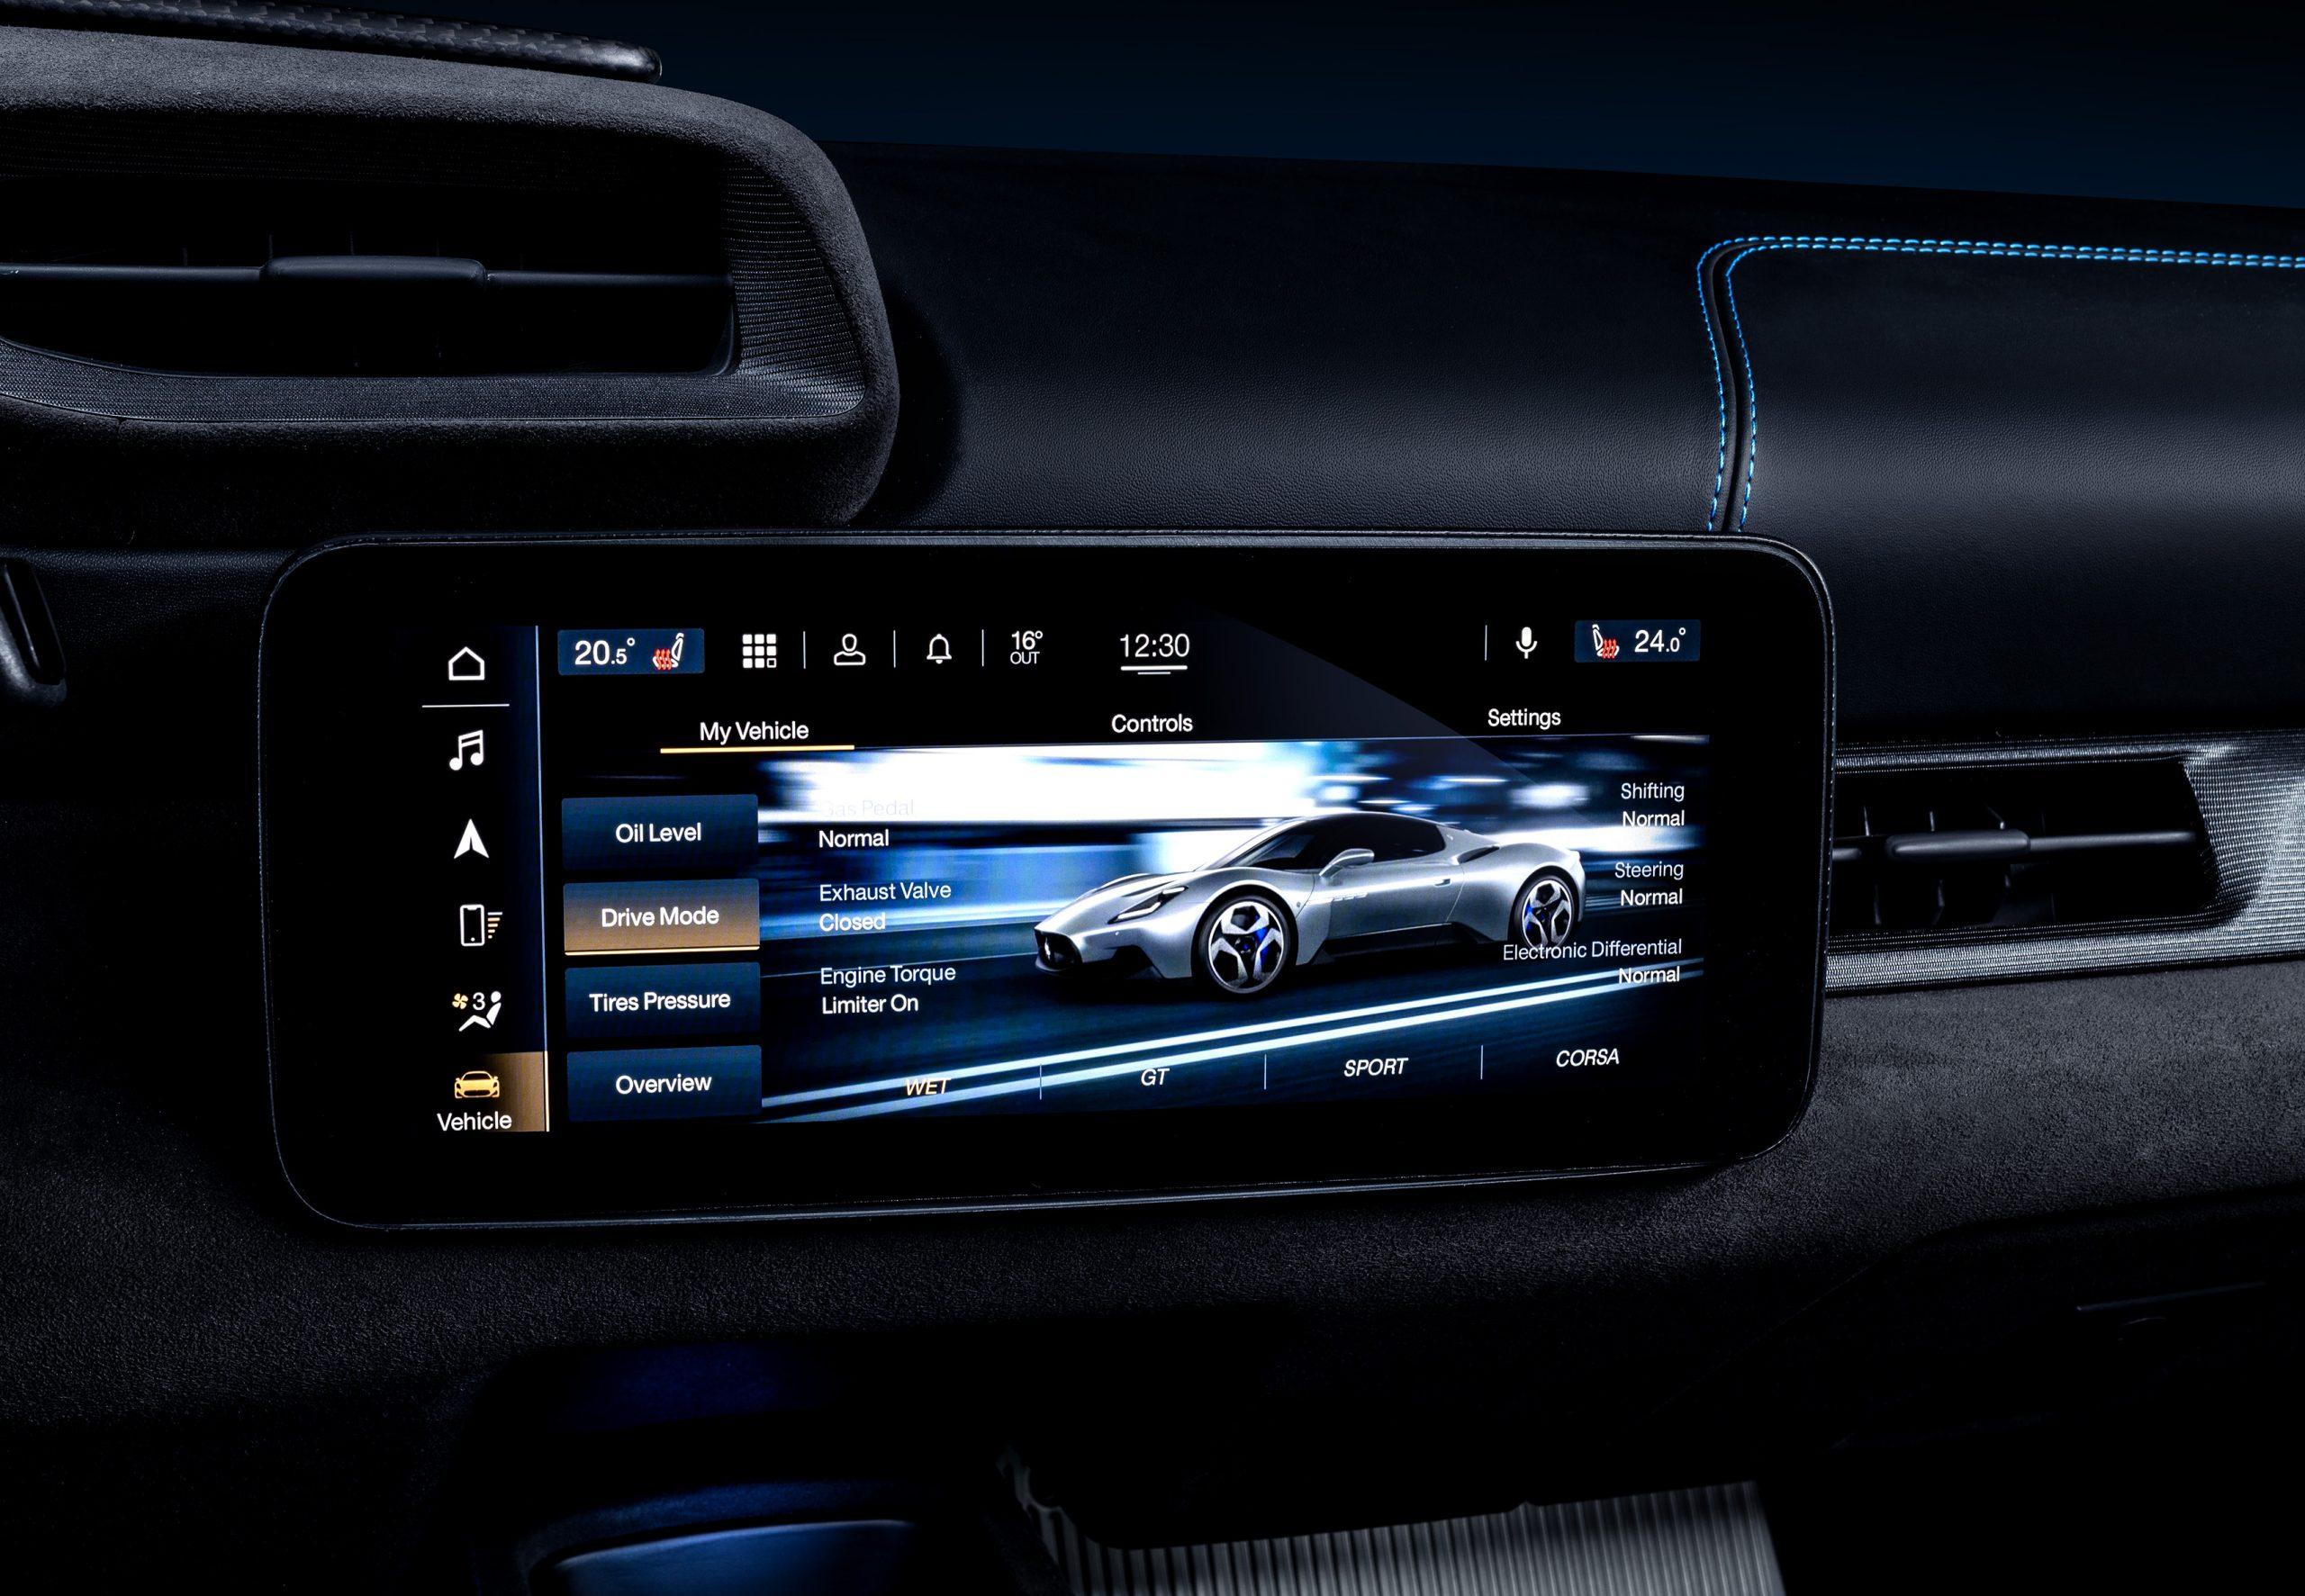 Maserati MC20 interior screen wet mode